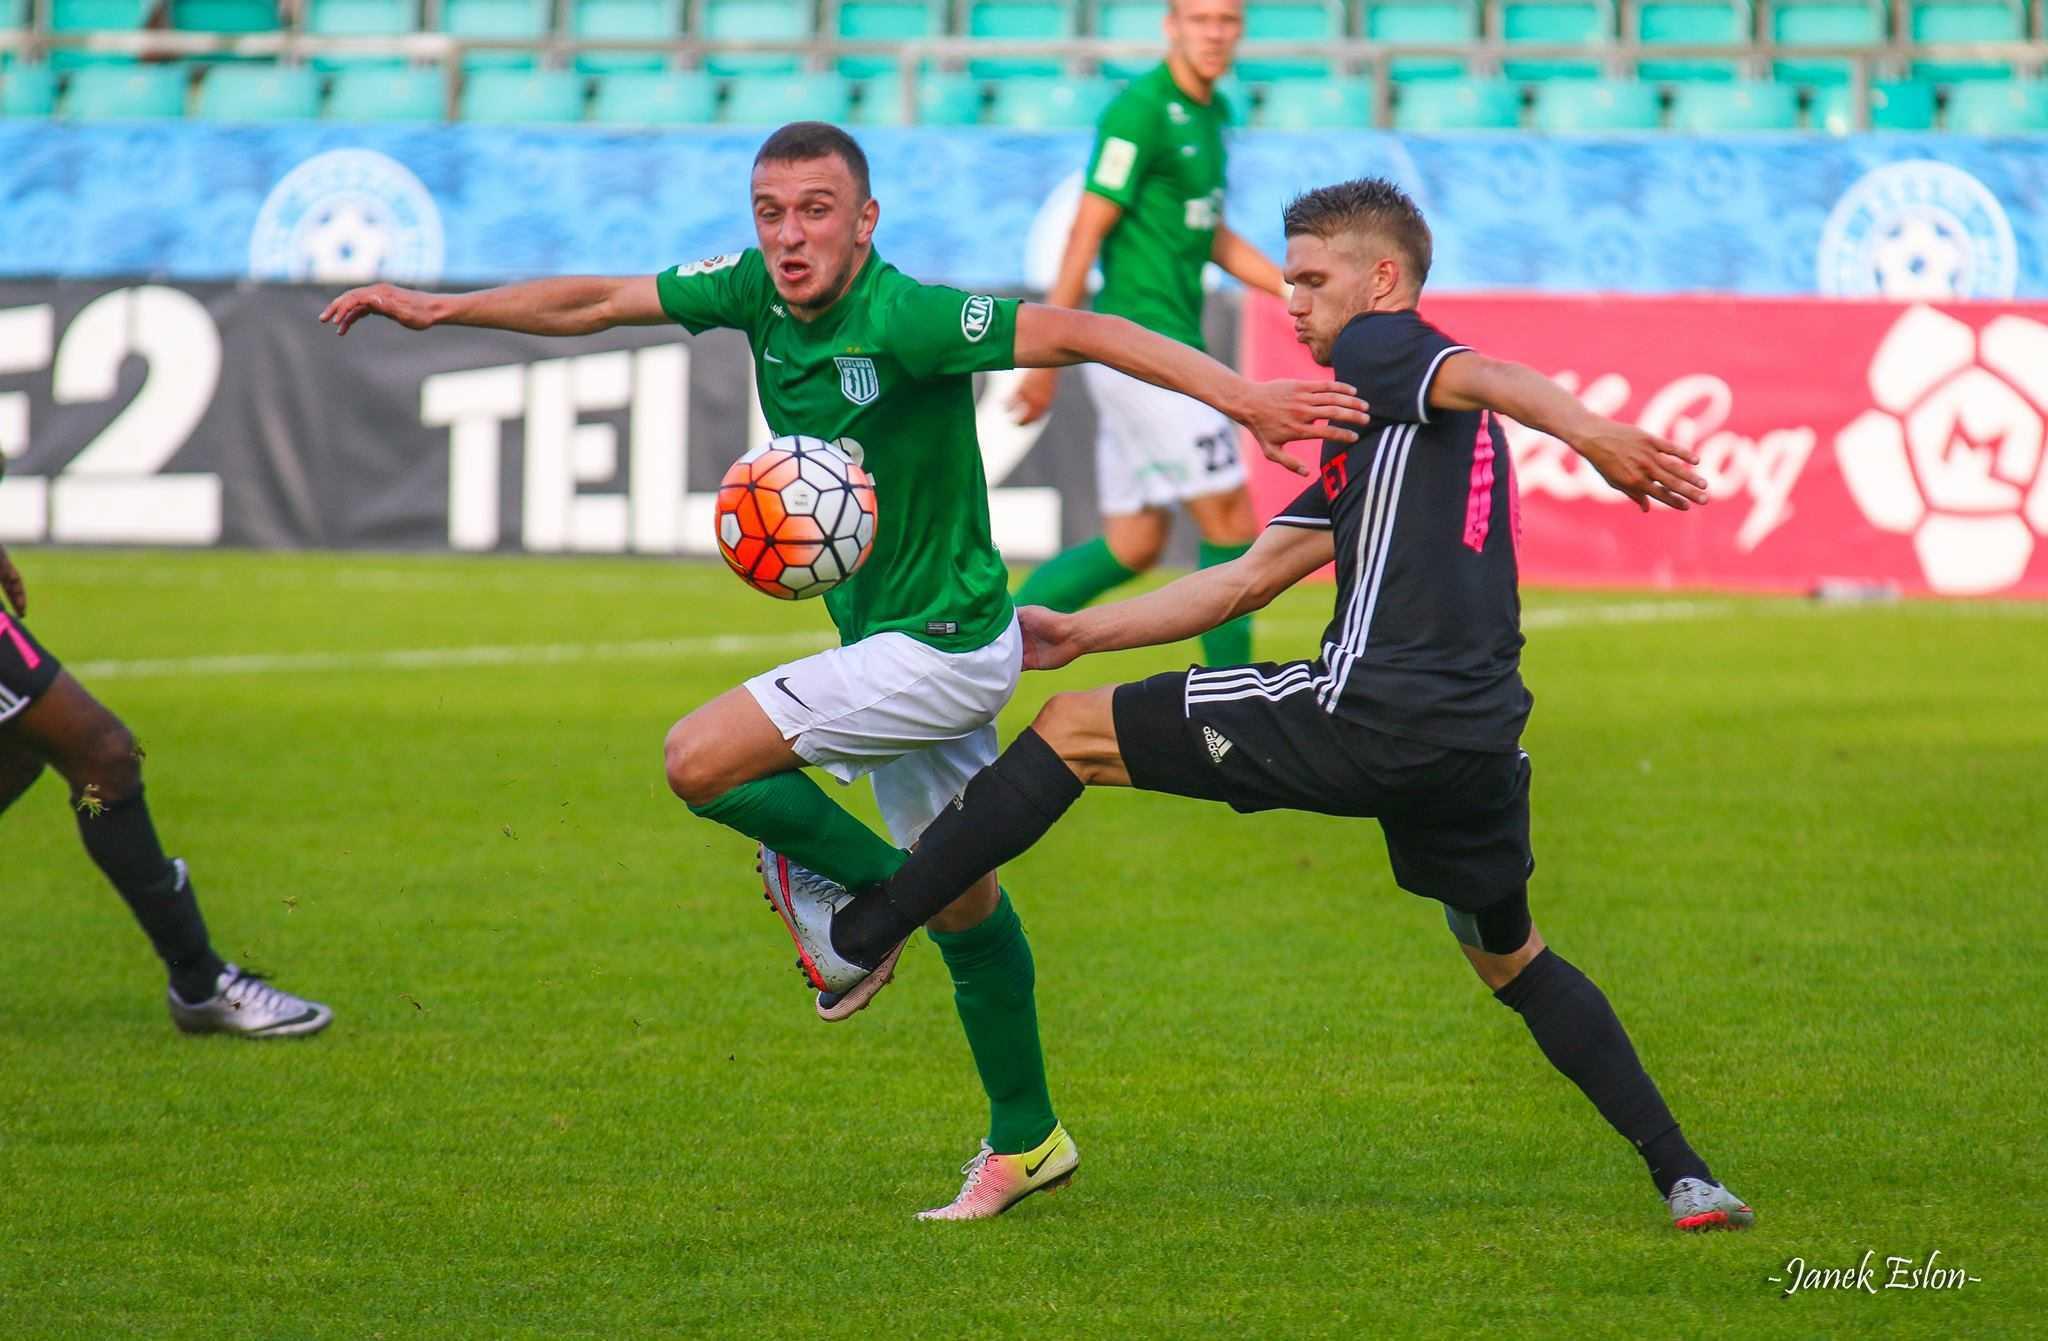 Maksim Gussev vs Nõmme Kalju 10. spetembril 2016